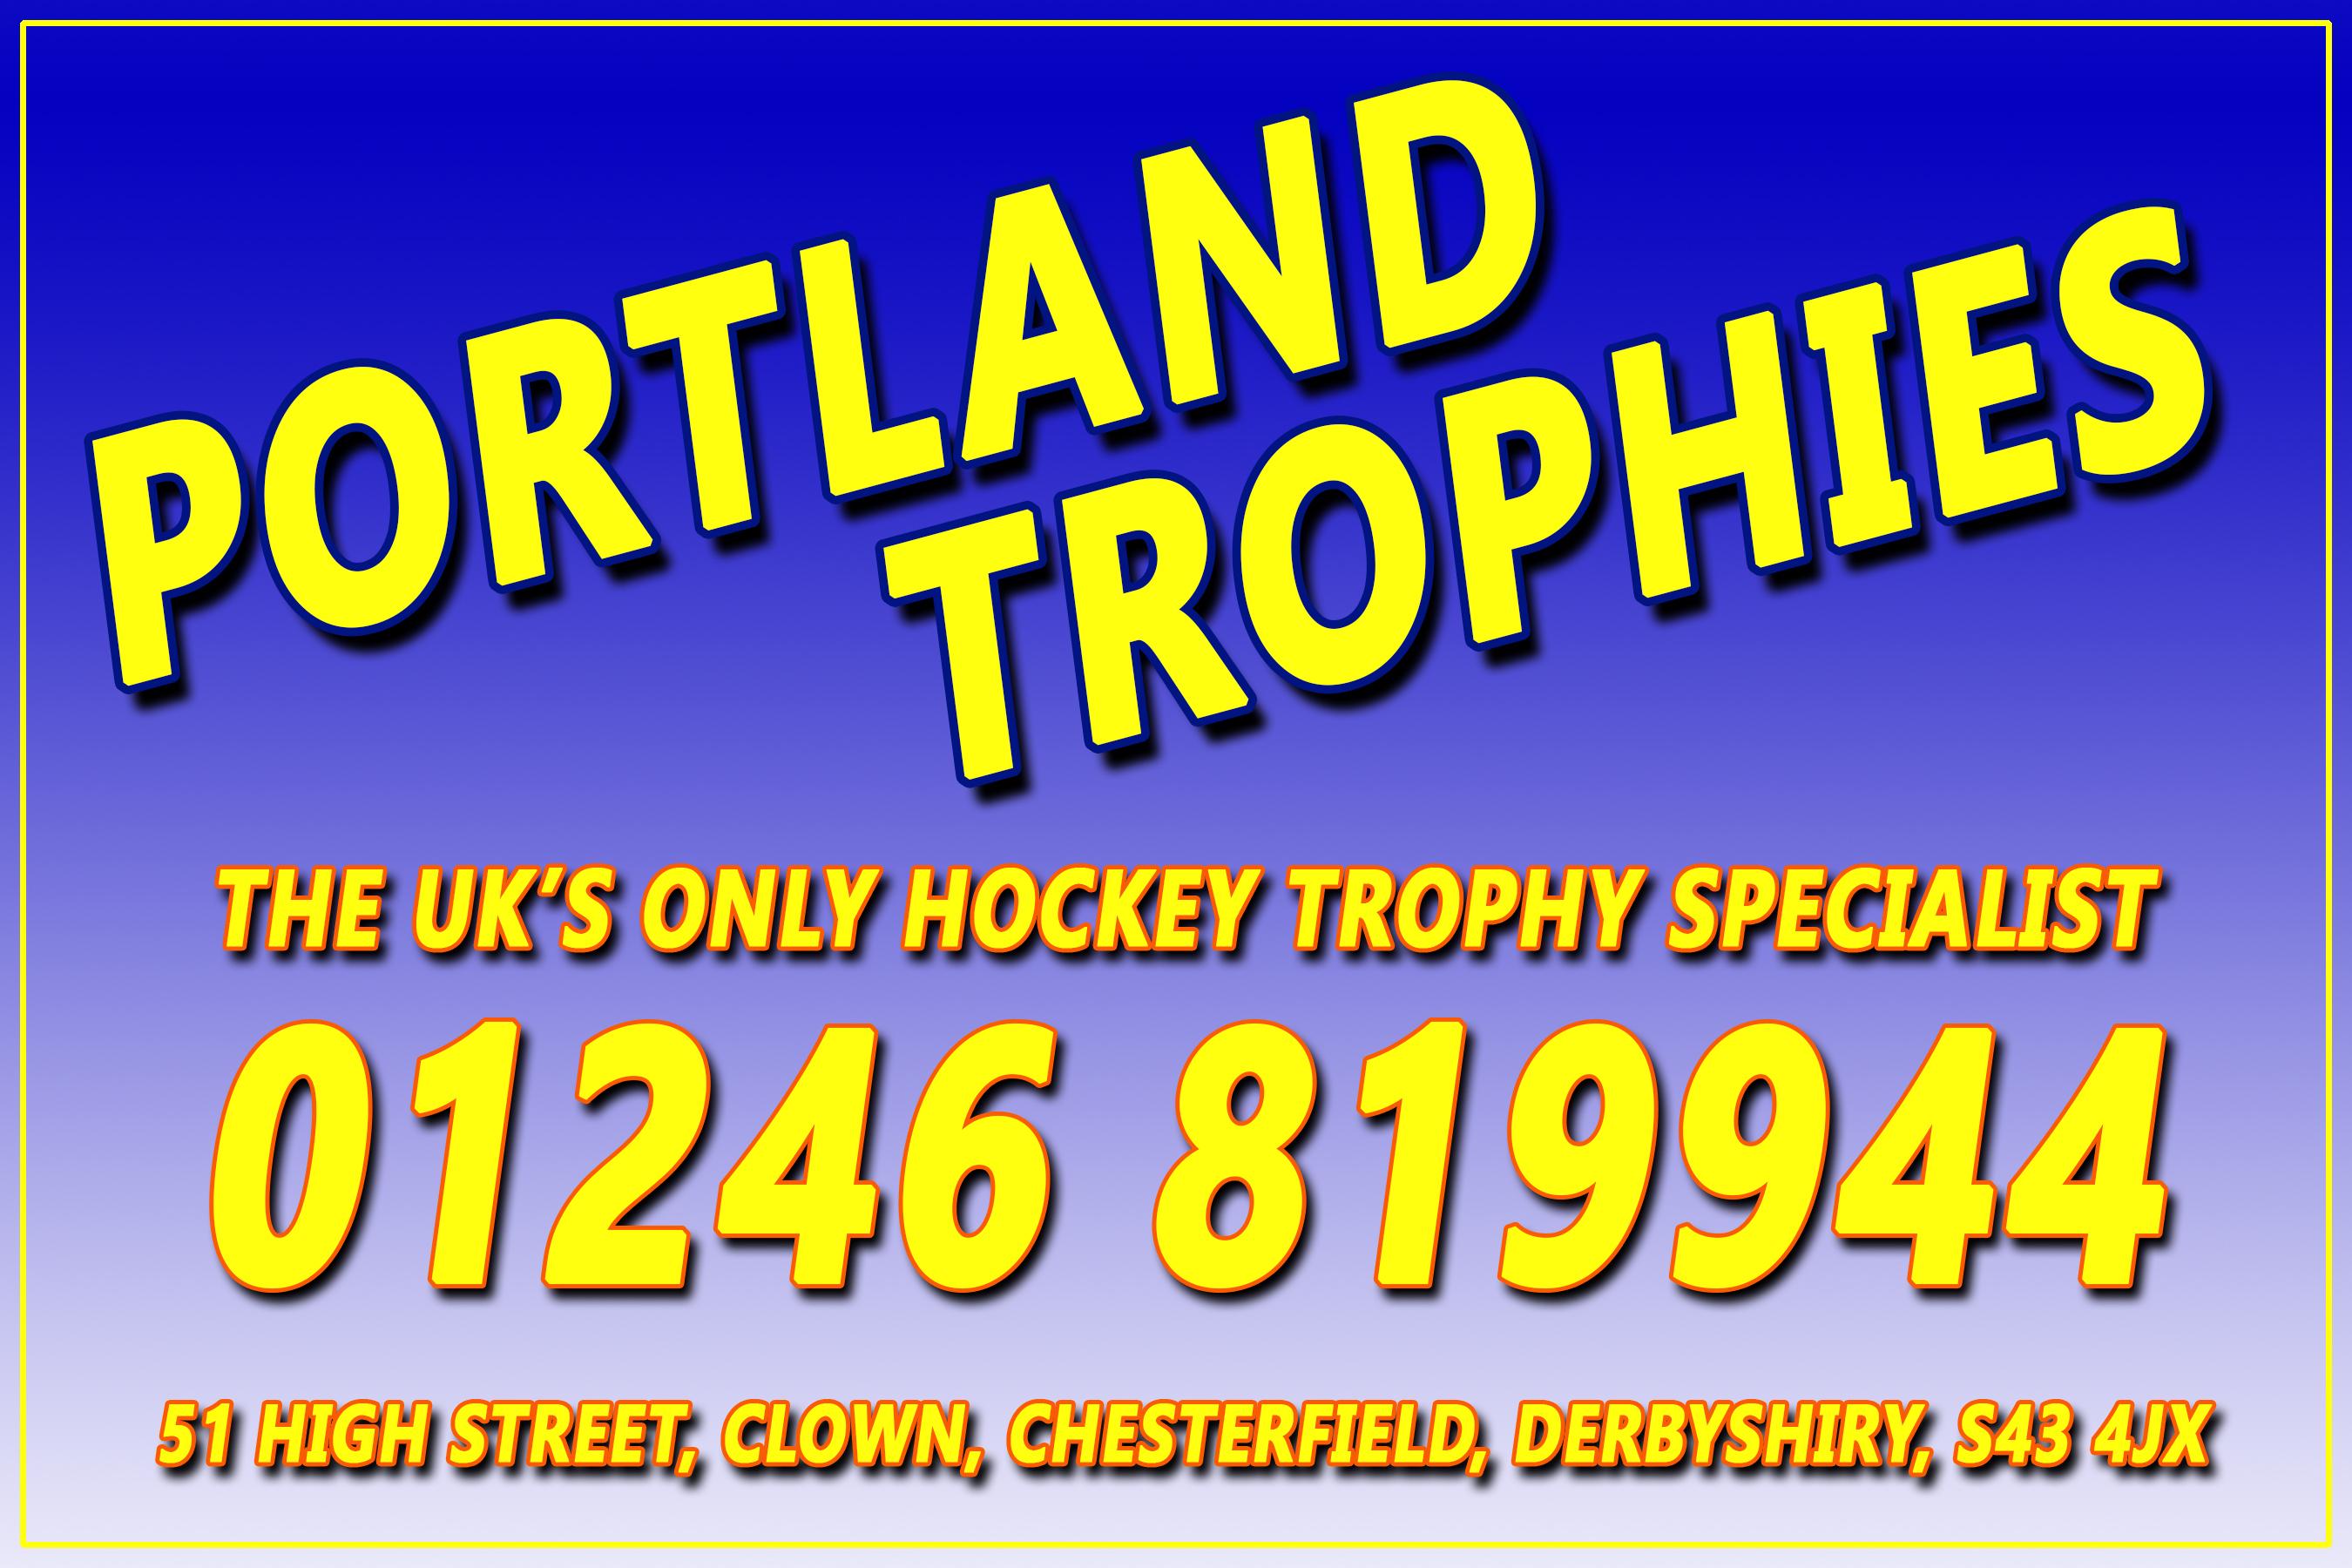 PortlandTrophies